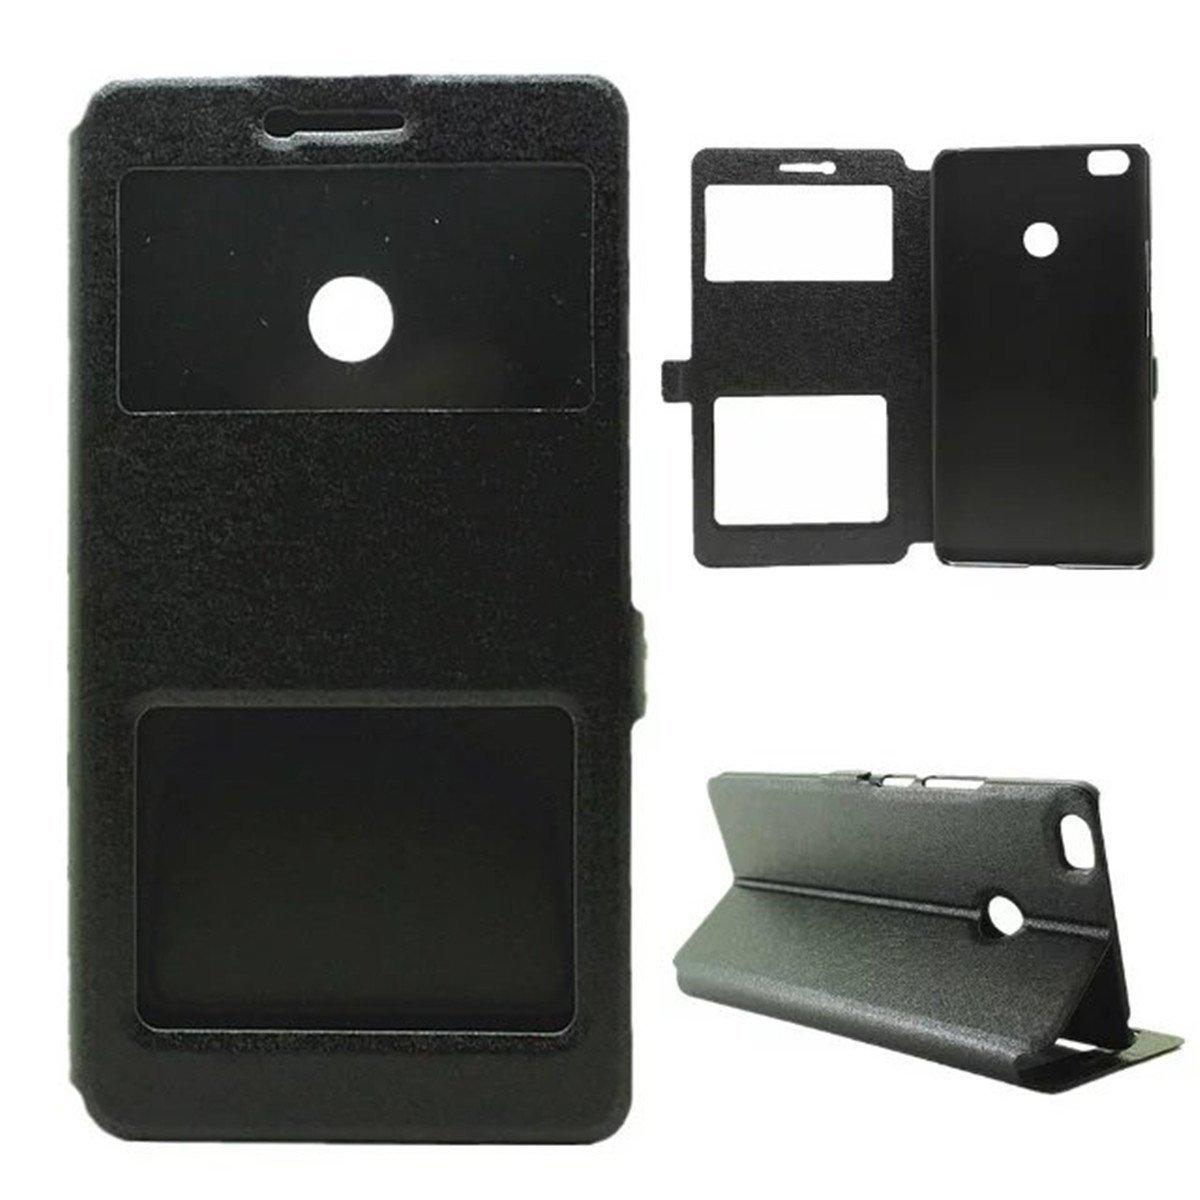 Xiaomi Mi Max Case,Gift_Source [Slim Fit] [Stand Feature] Silk Flip Window View PU Leather Case Flip Cover Folio Case for Xiaomi Mi Max/Max 6.44 Inch [Black]